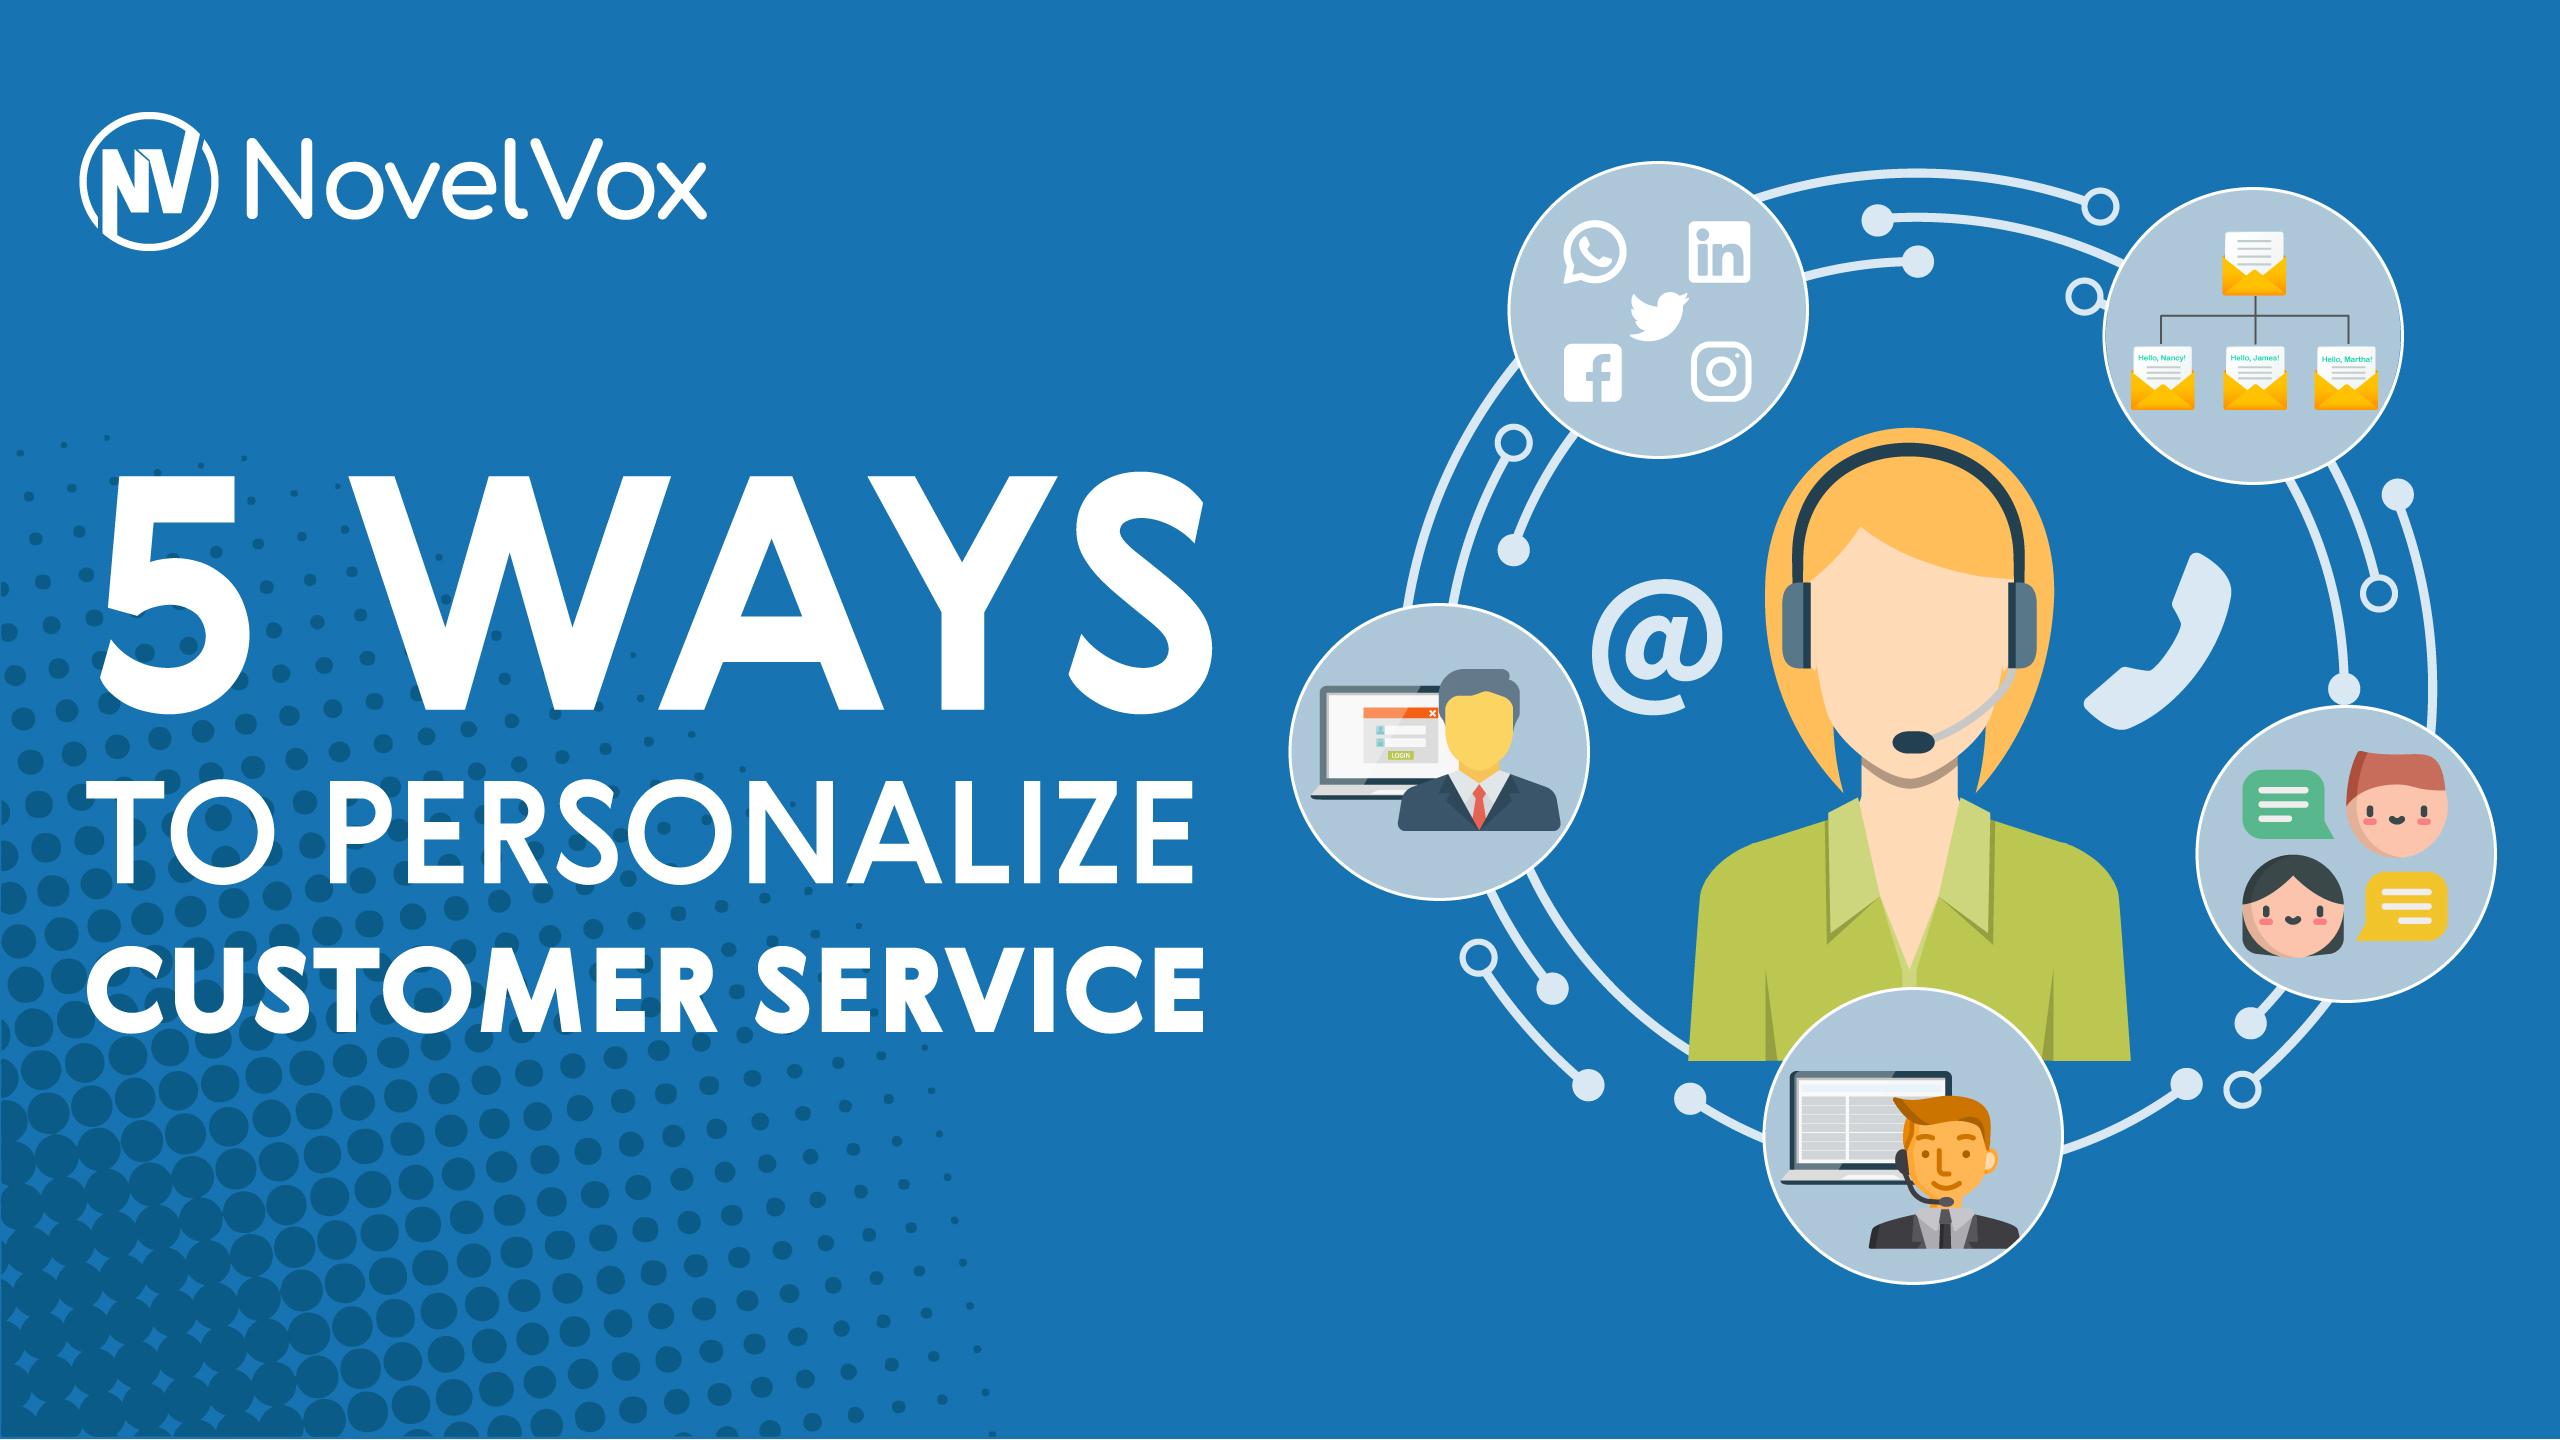 Personalize customer service